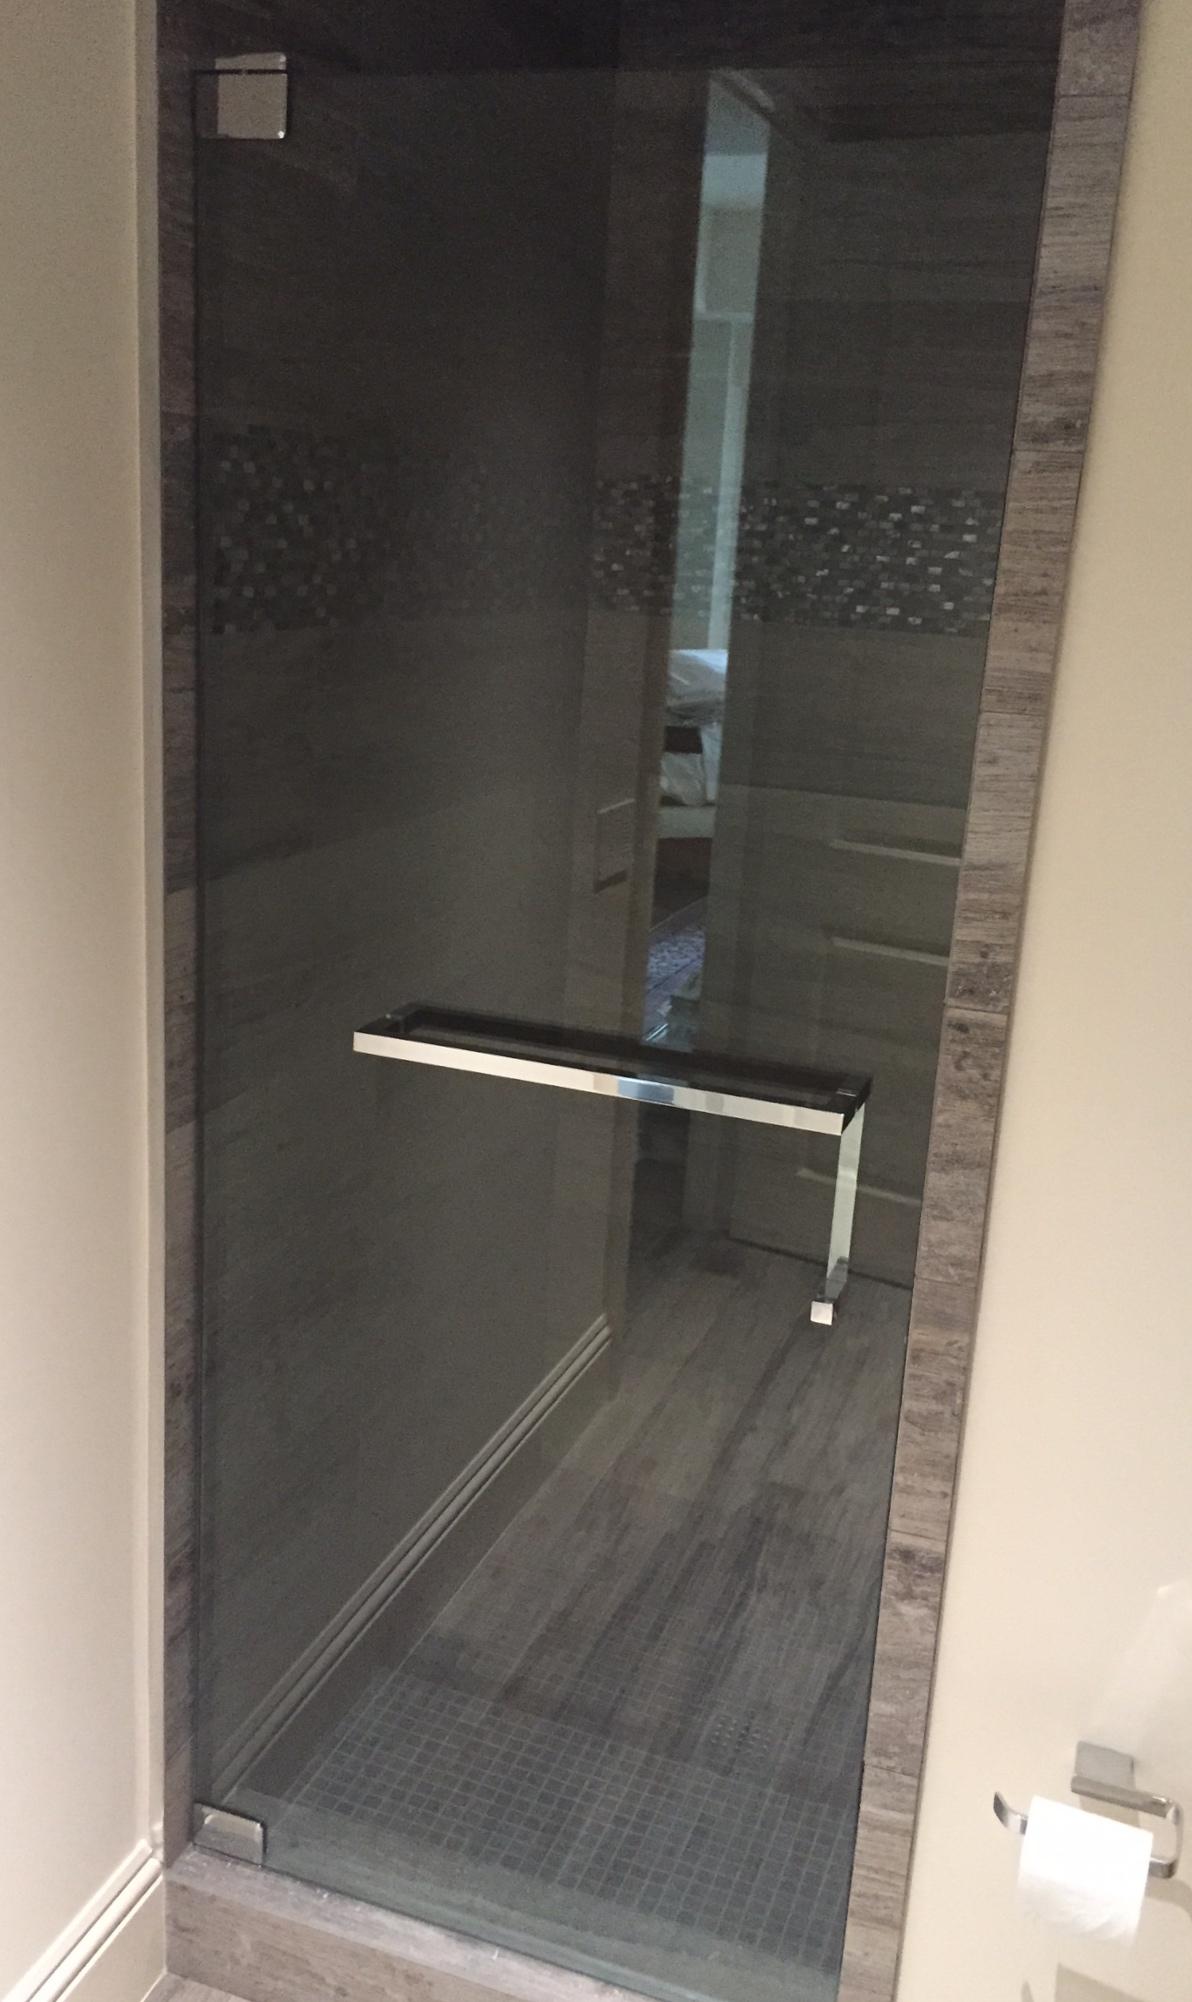 Bathroom Showers And Towel Rack Options